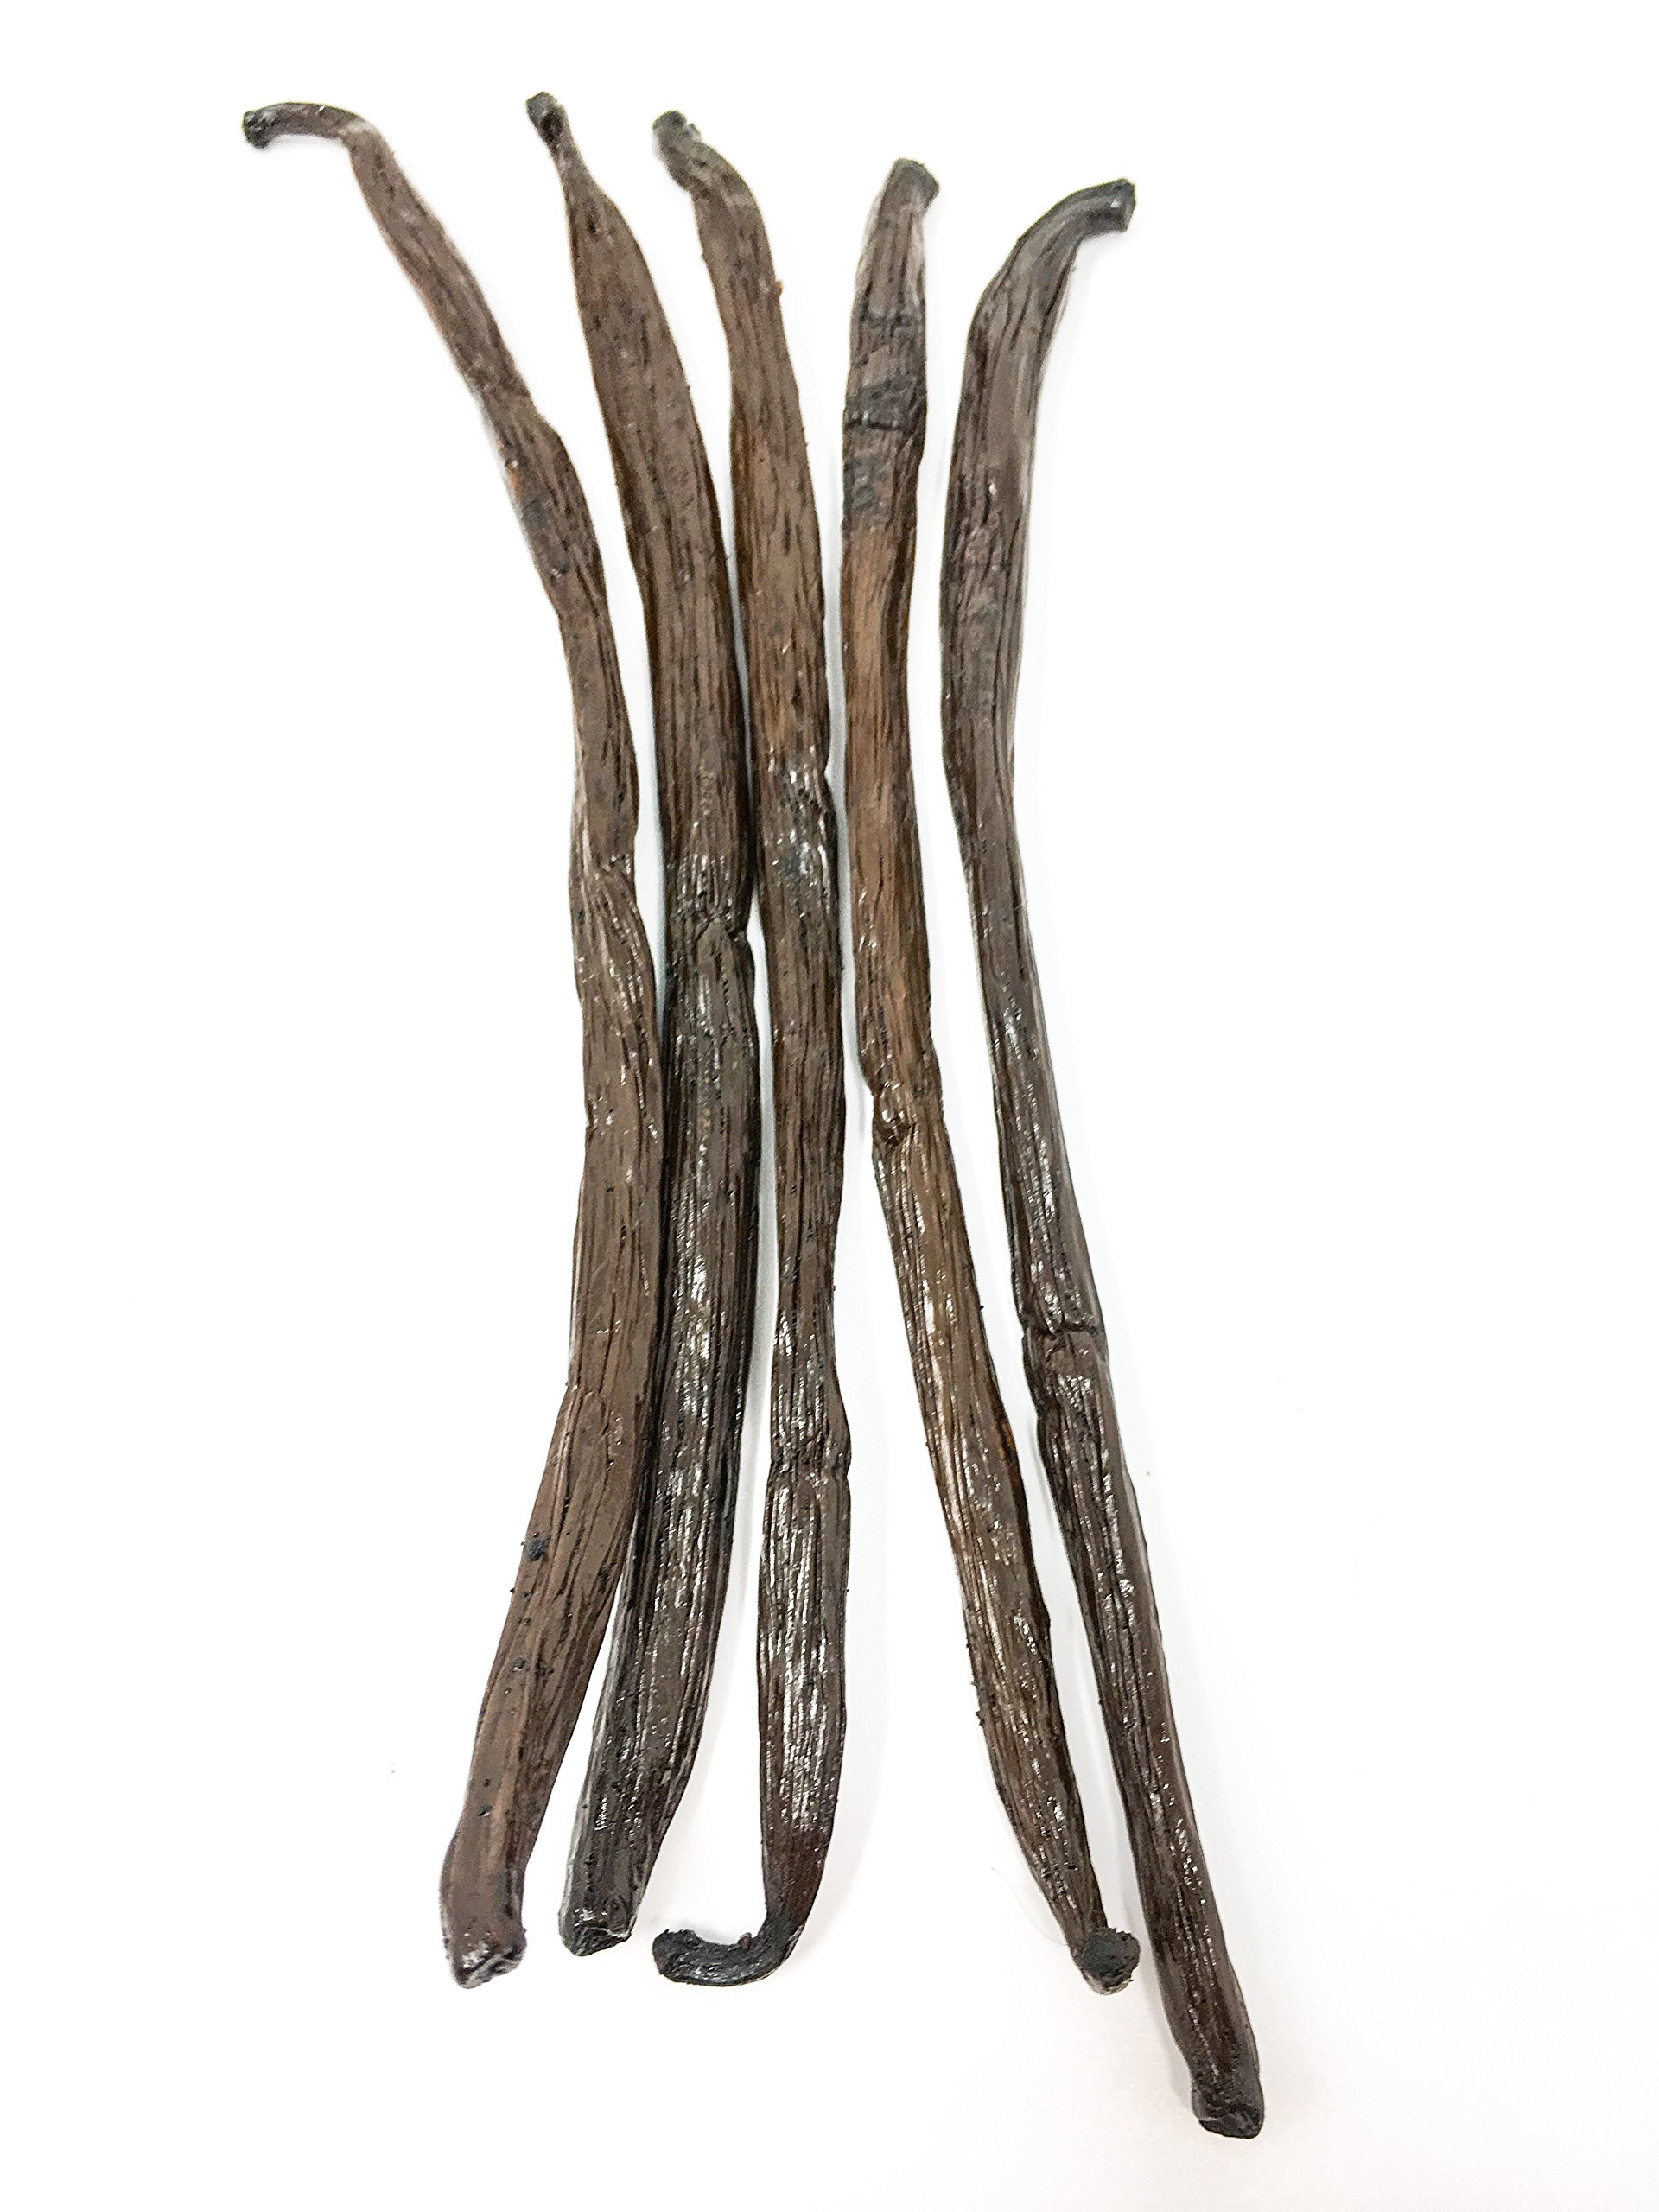 Madagascar Bourbon Vanilla Beans (Vanilla Planifolia) by Slofoodgroup (5 Vanilla Beans)